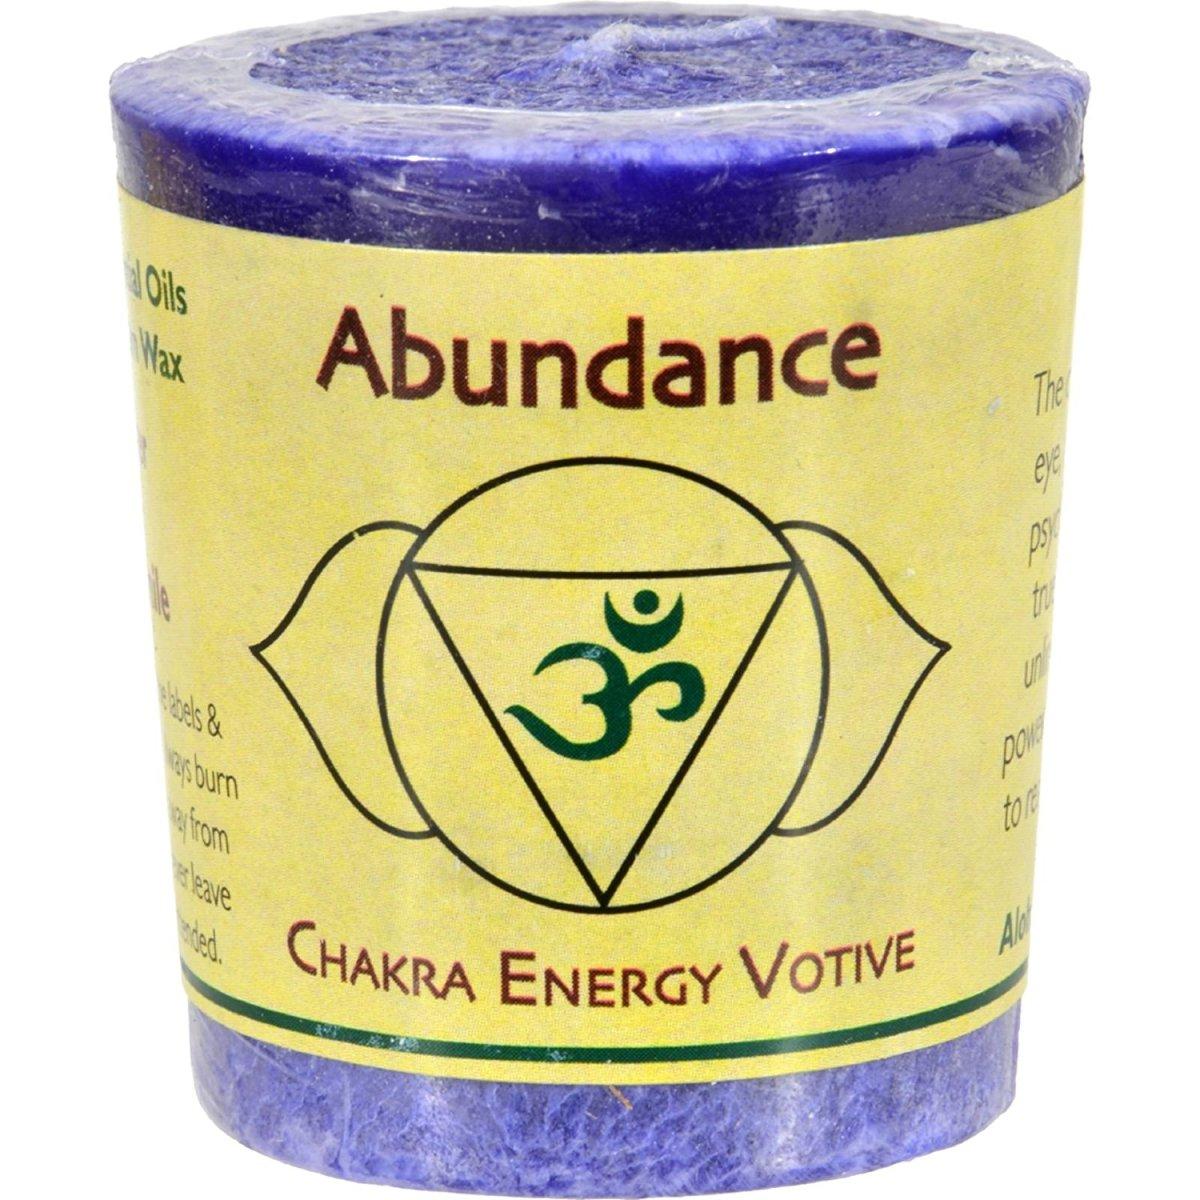 Abundance energy votive with activation